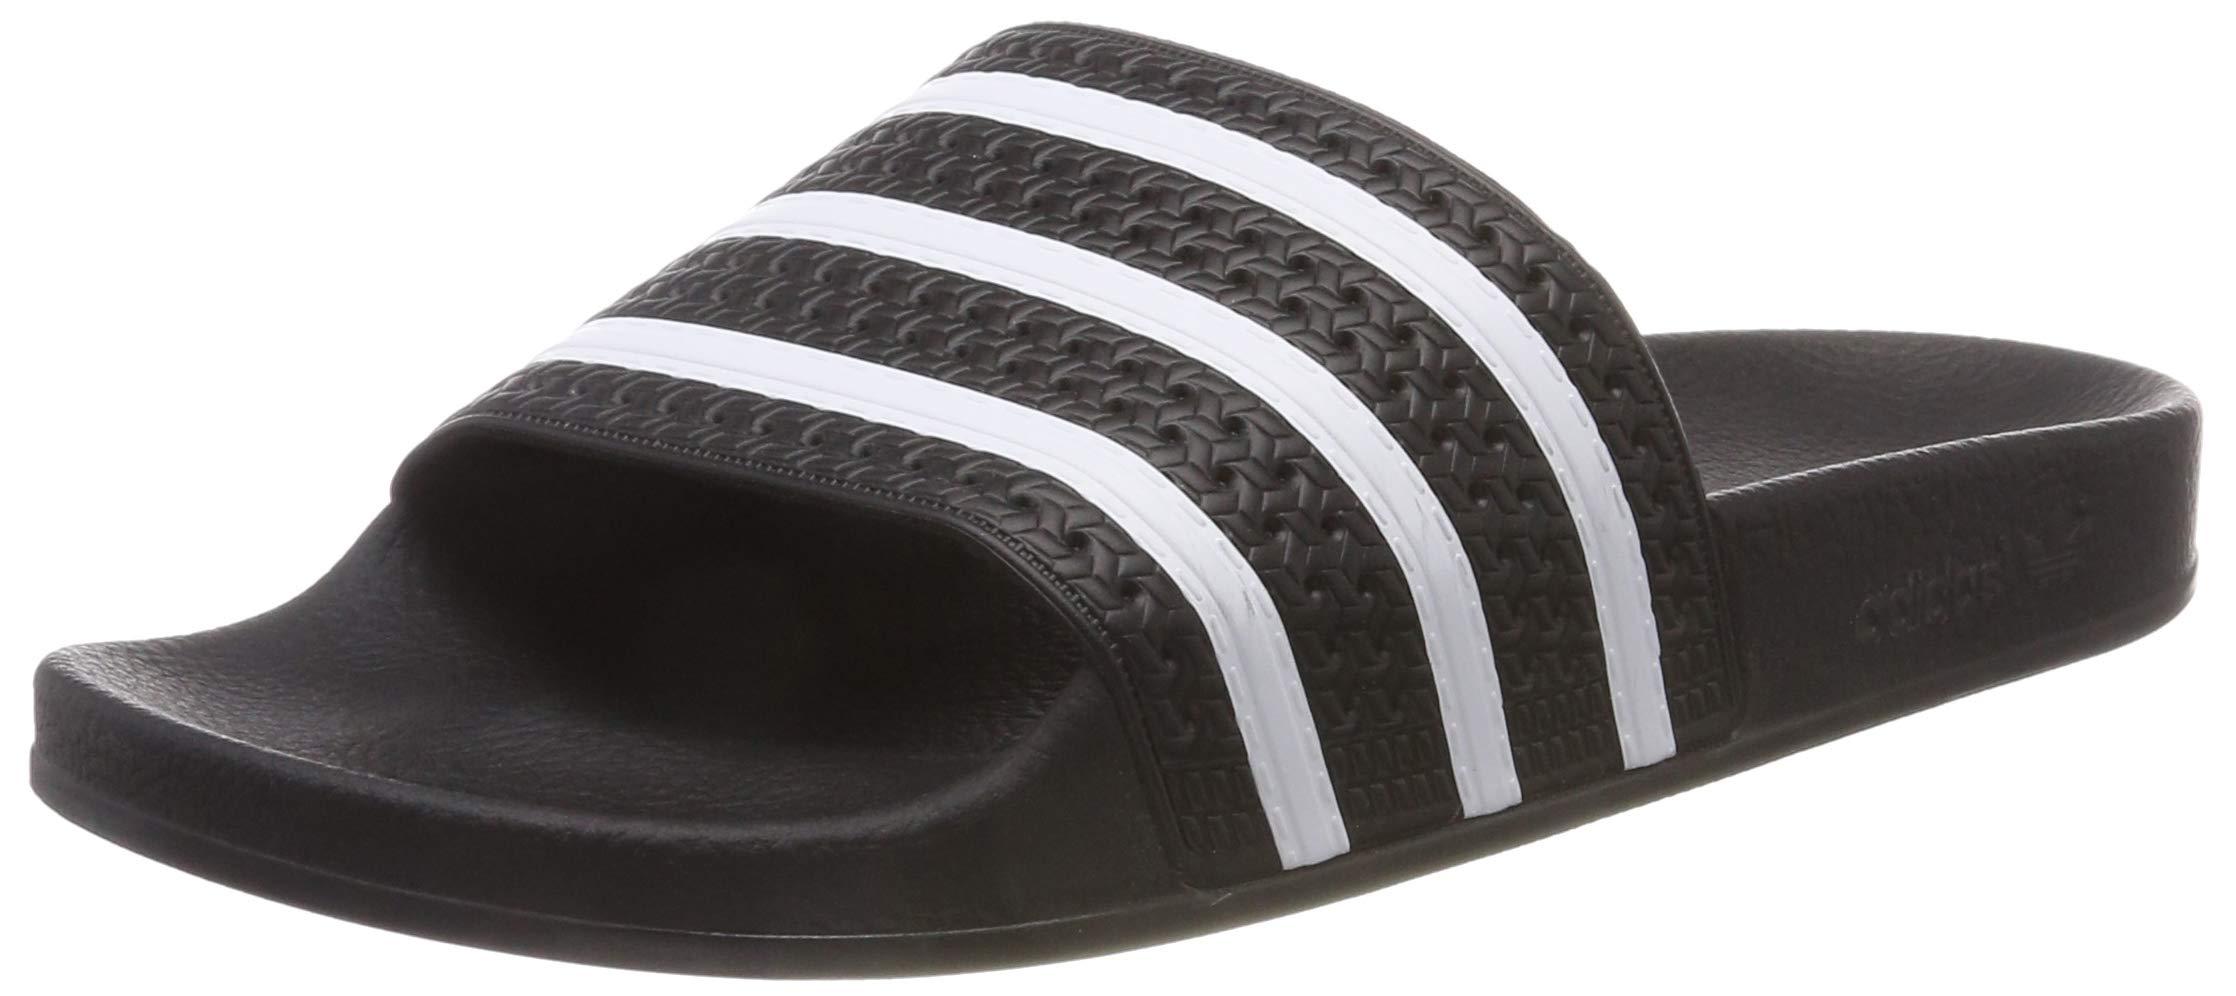 cfc9fc8462214 adidas Originals Men's Adilette Slide Sandals, White/Black, ((10 M US)